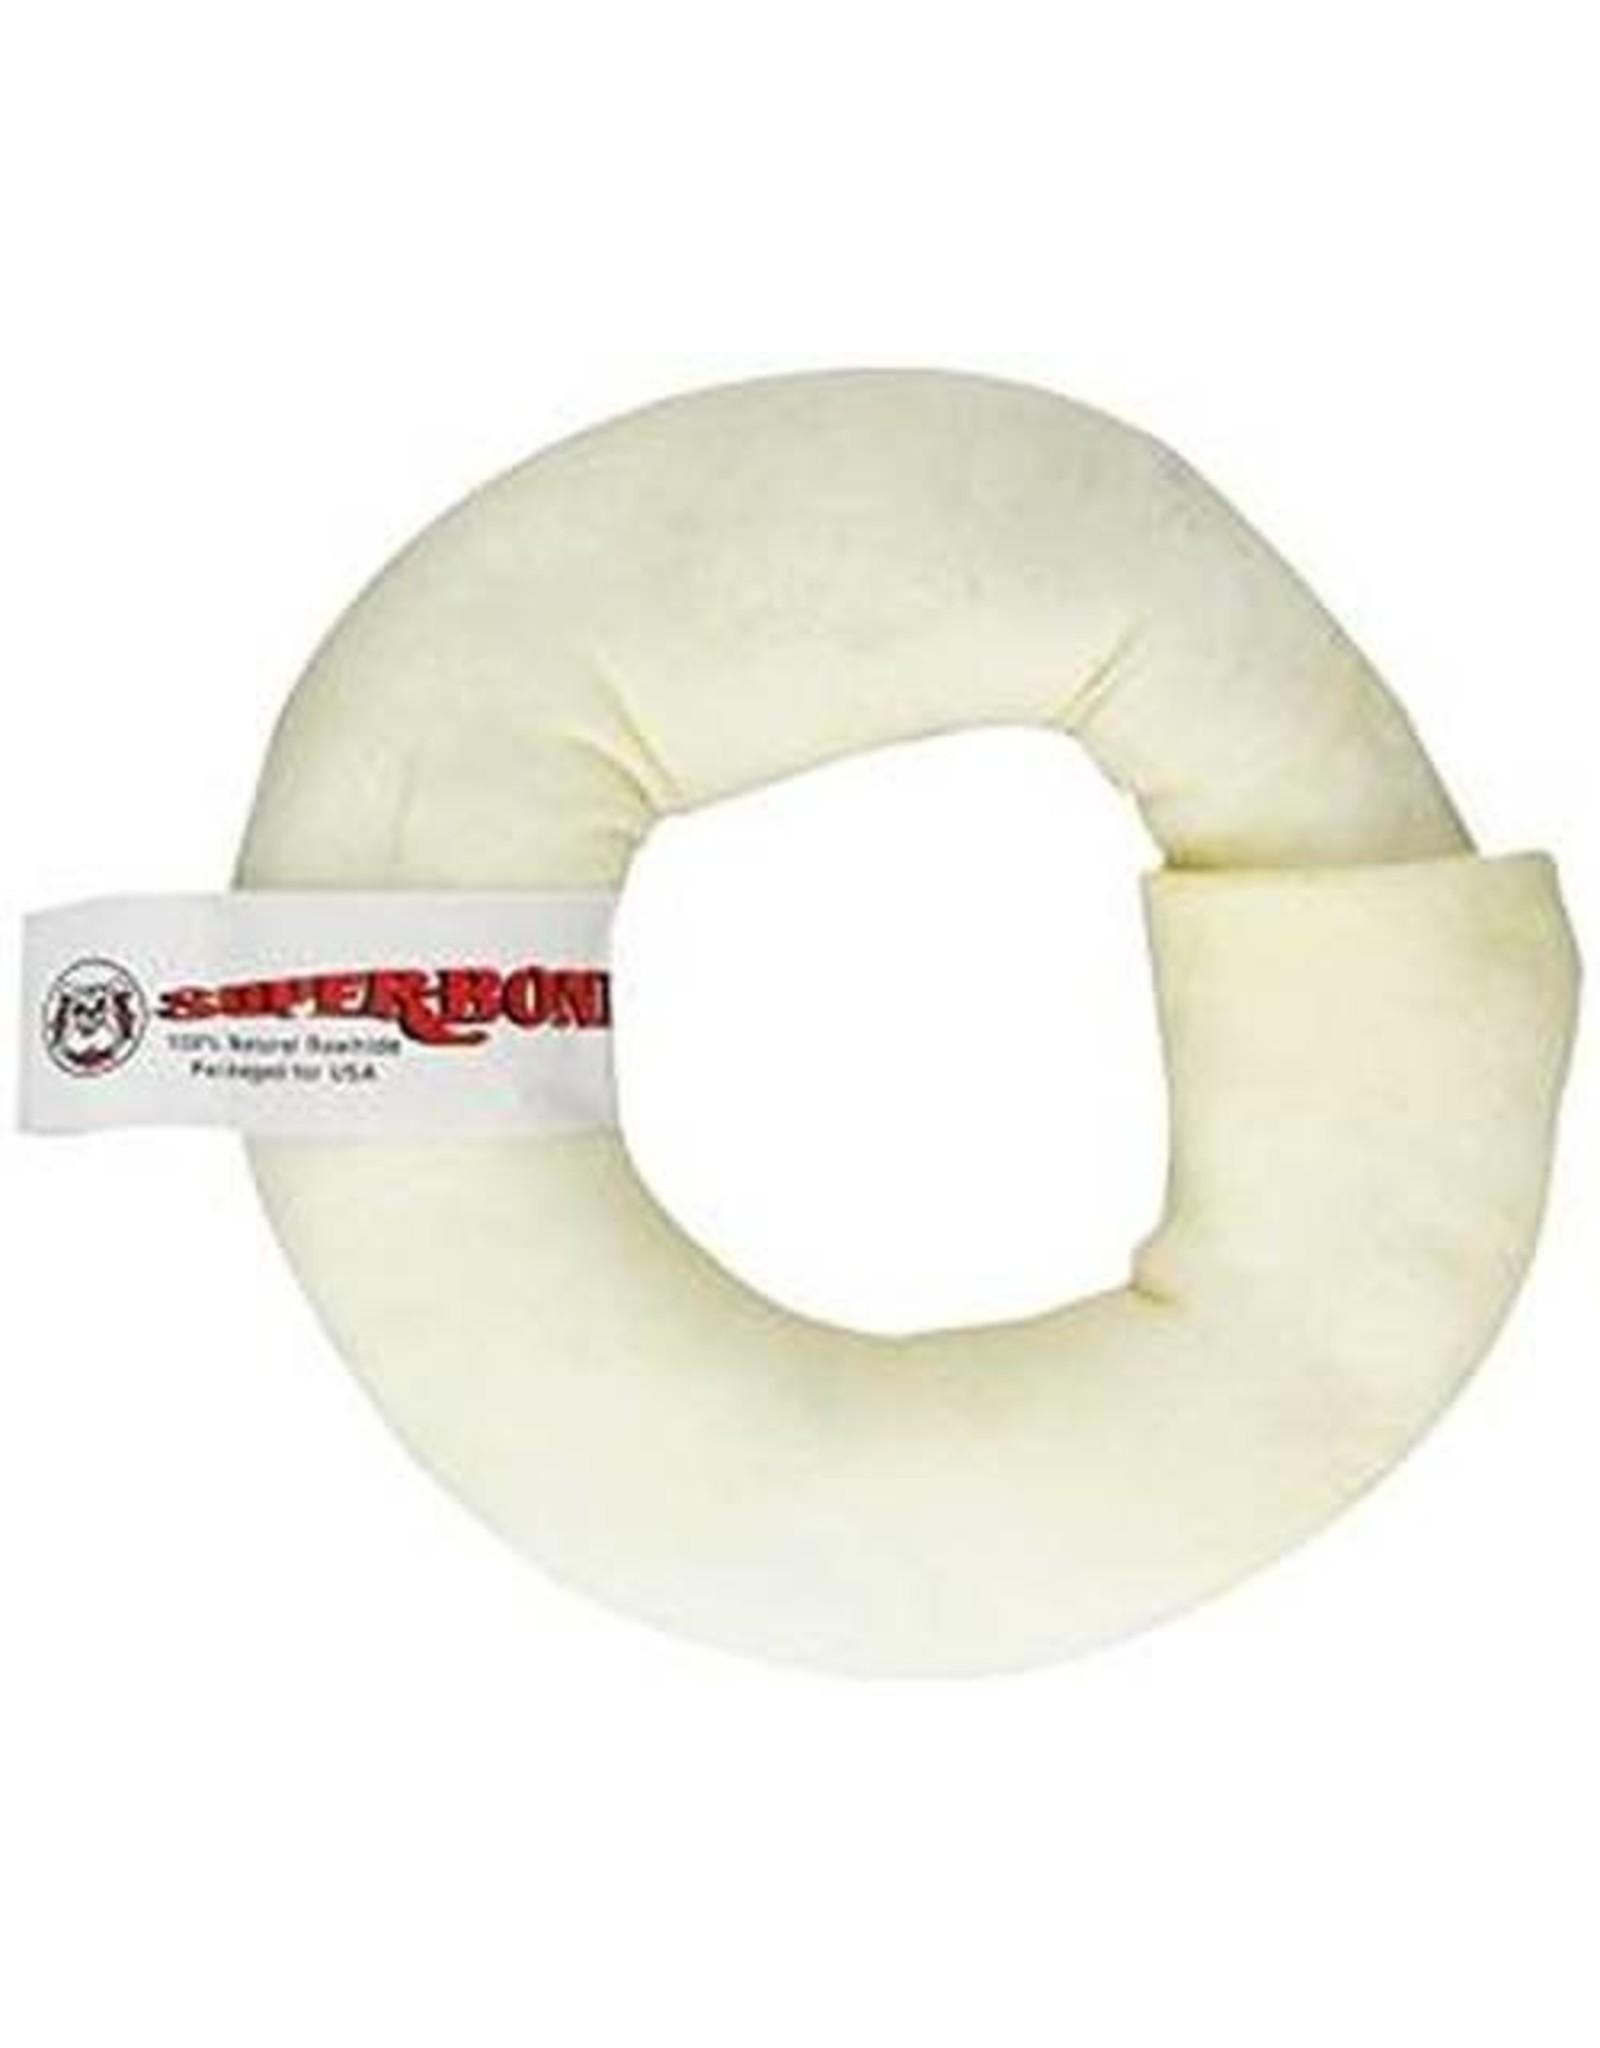 Super Bone Super Bone Rawhide Donut Medium Dog Chew